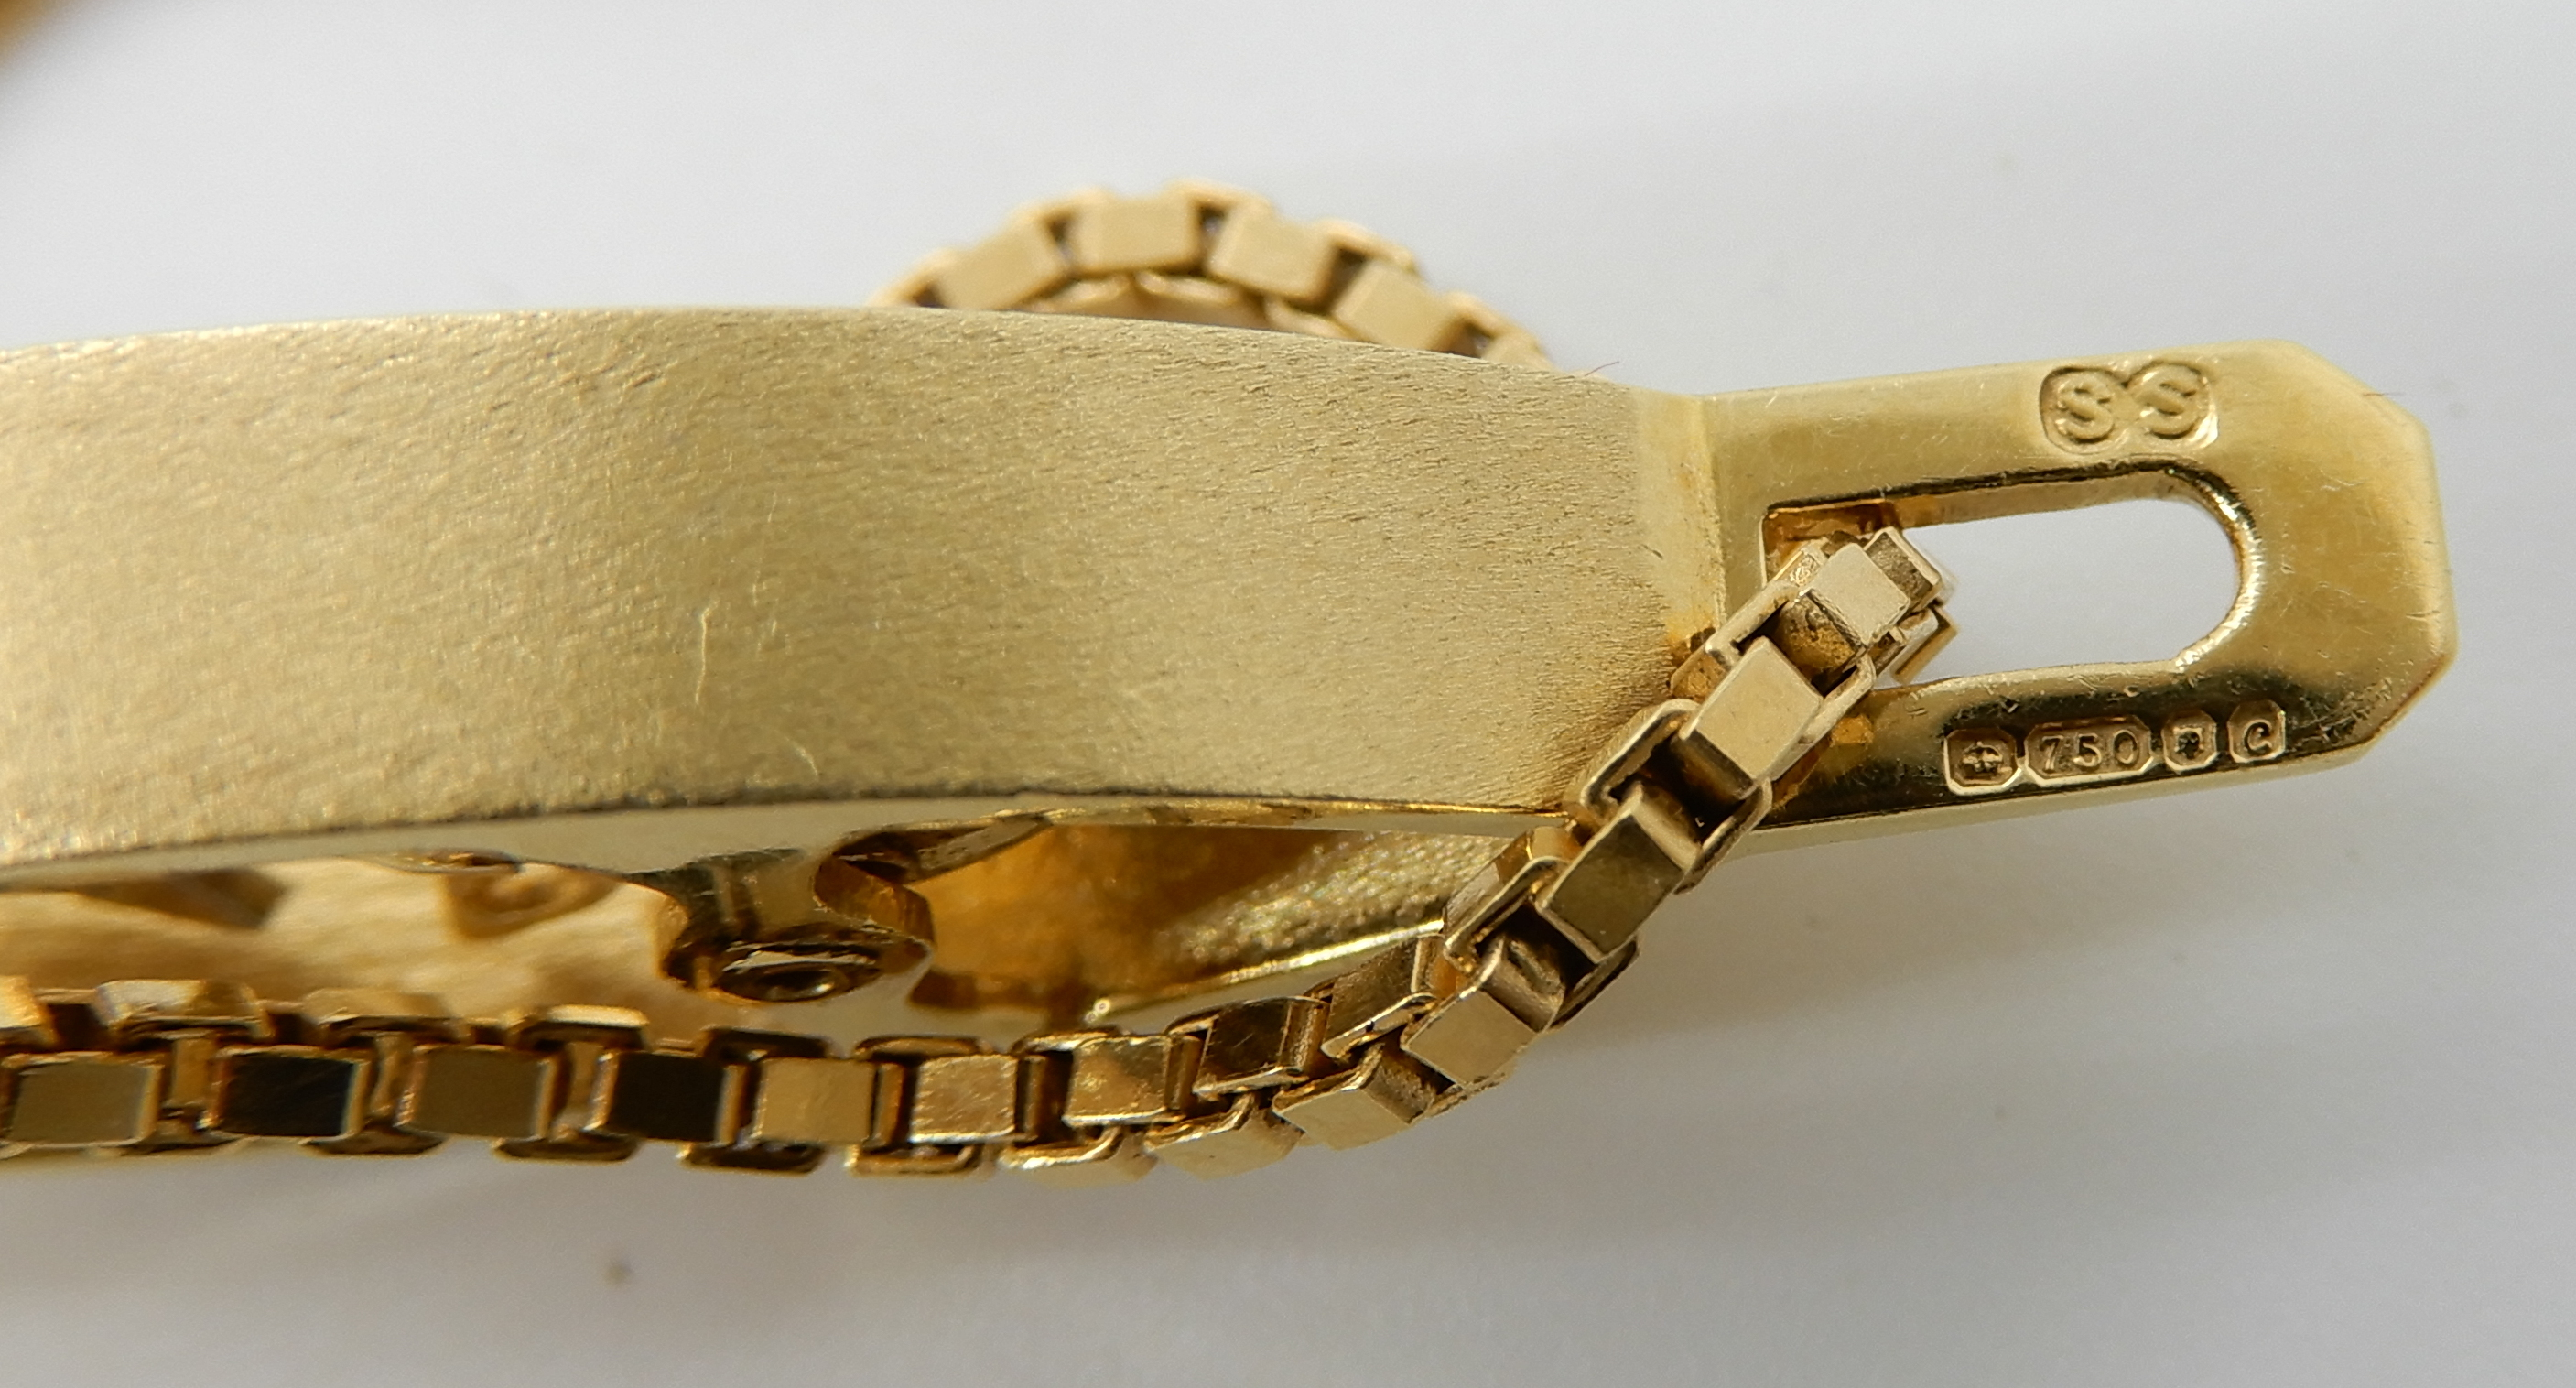 Lot 23 - An 18ct gold retro diamond set flower pendant length 4cm and 18ct box chain length 40cm, weight 16.